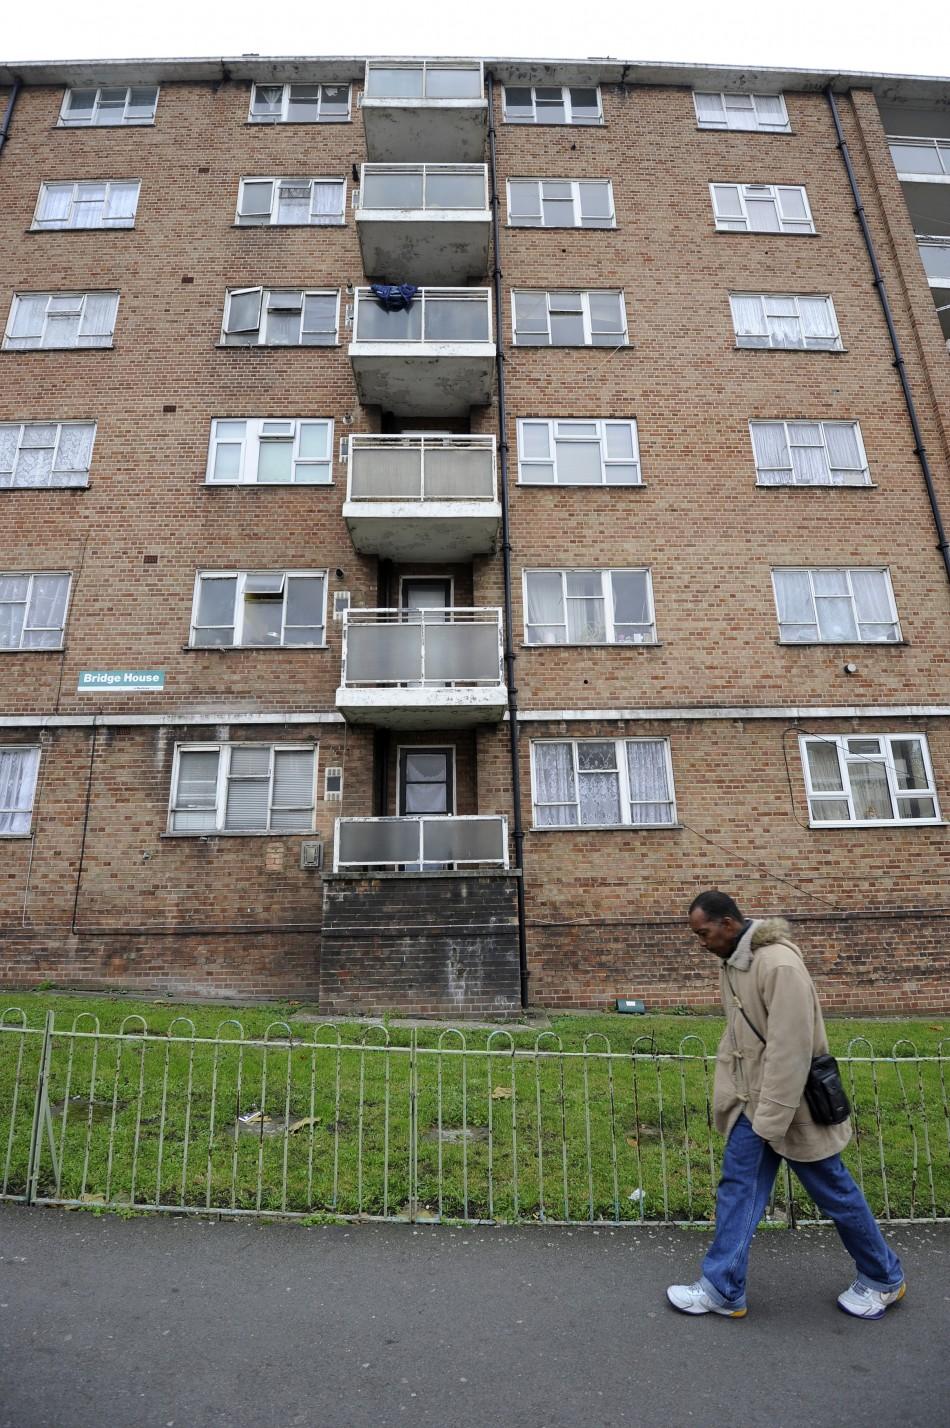 UK council housing